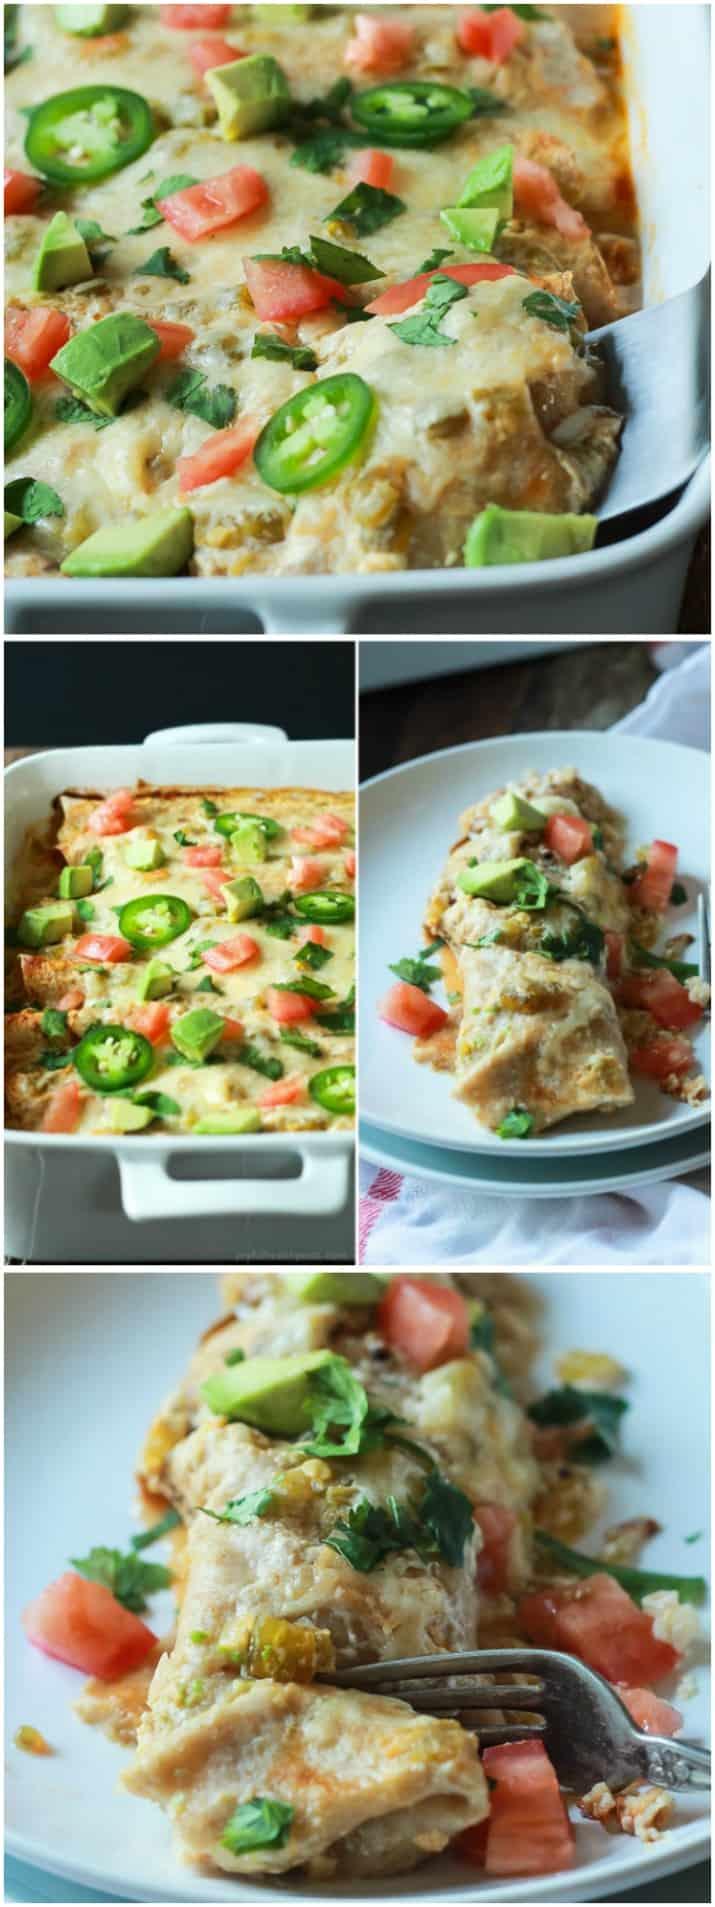 Easy Chicken Enchilada Recipe with Creamy Green Chili Sauce | Easy ...